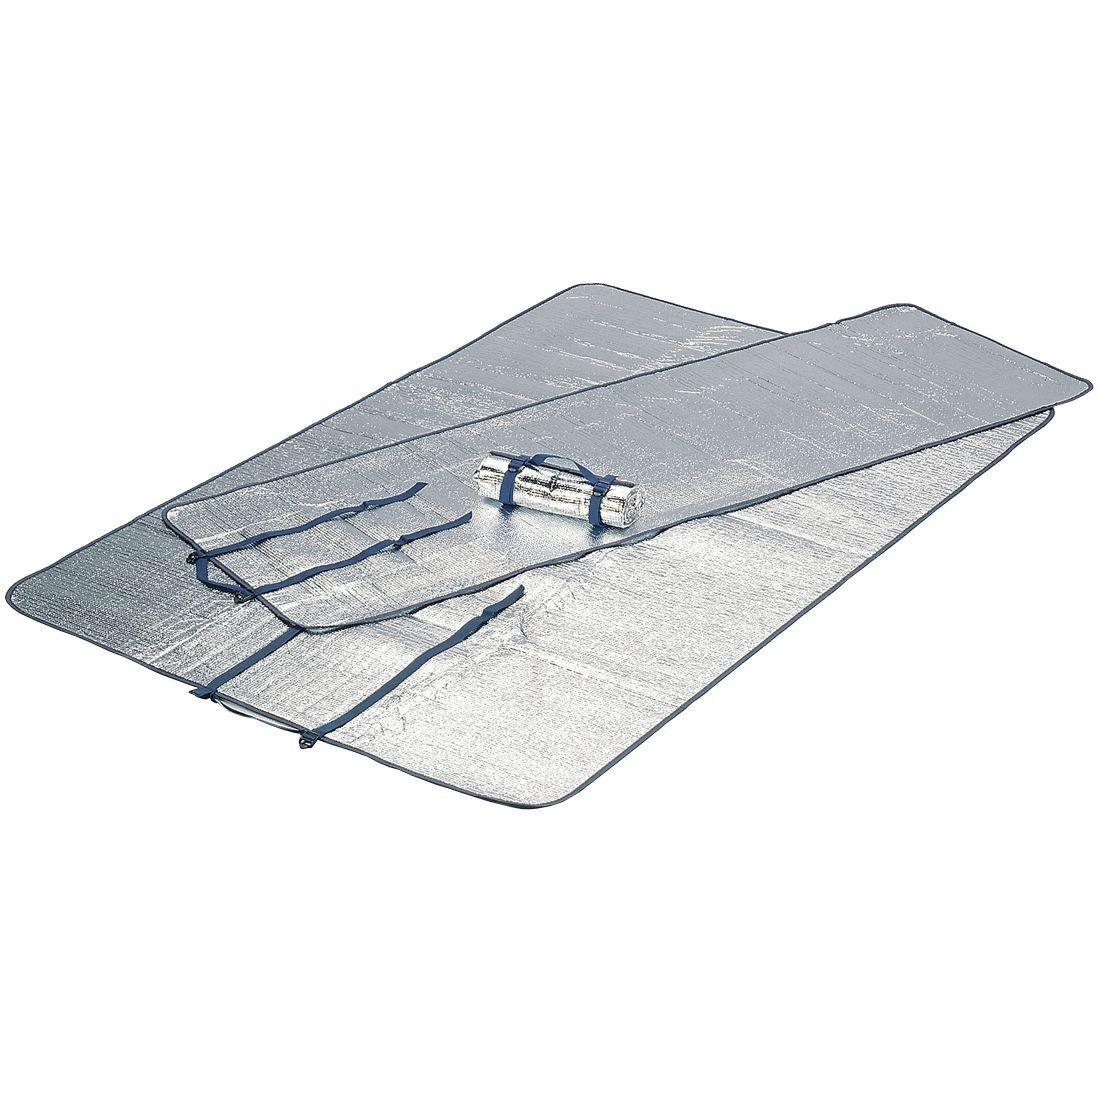 Коврик HIGH PEAK Alumatte Single, серебристый, 190 x 60 x 0,2 см